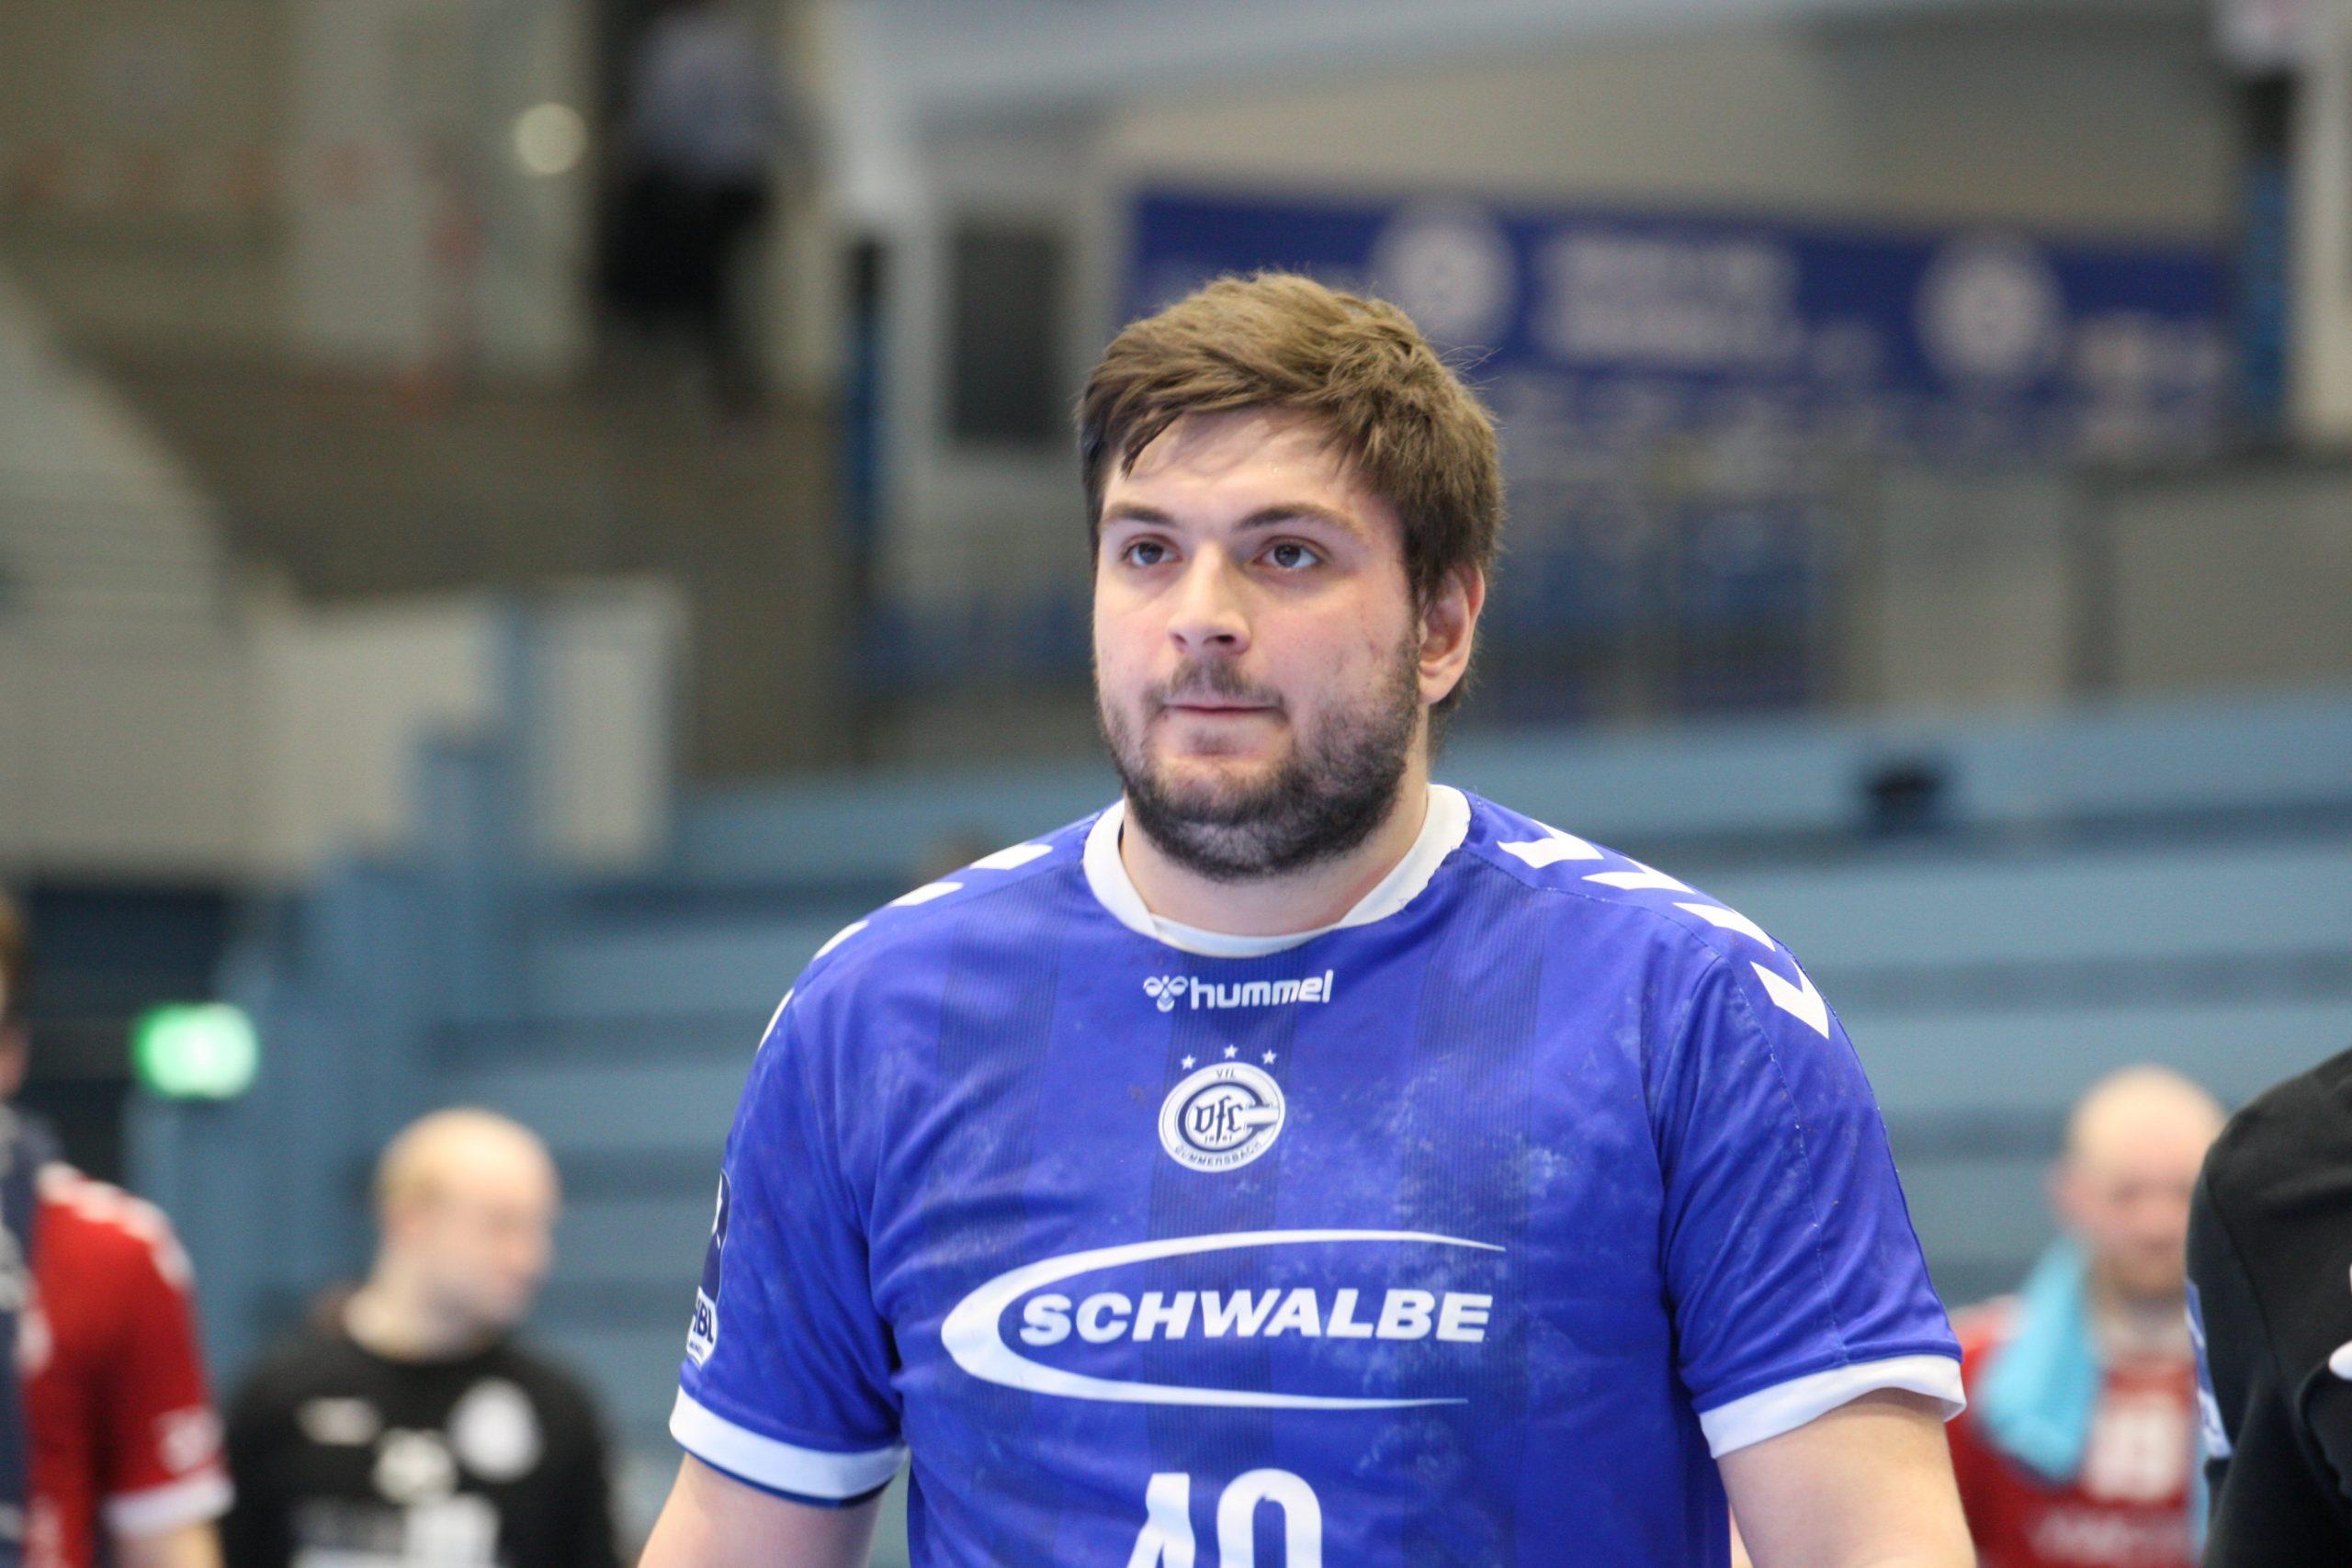 Gummersbach will mit dem dritten Sieg im dritten Spiel den Saisonstart perfekt machen